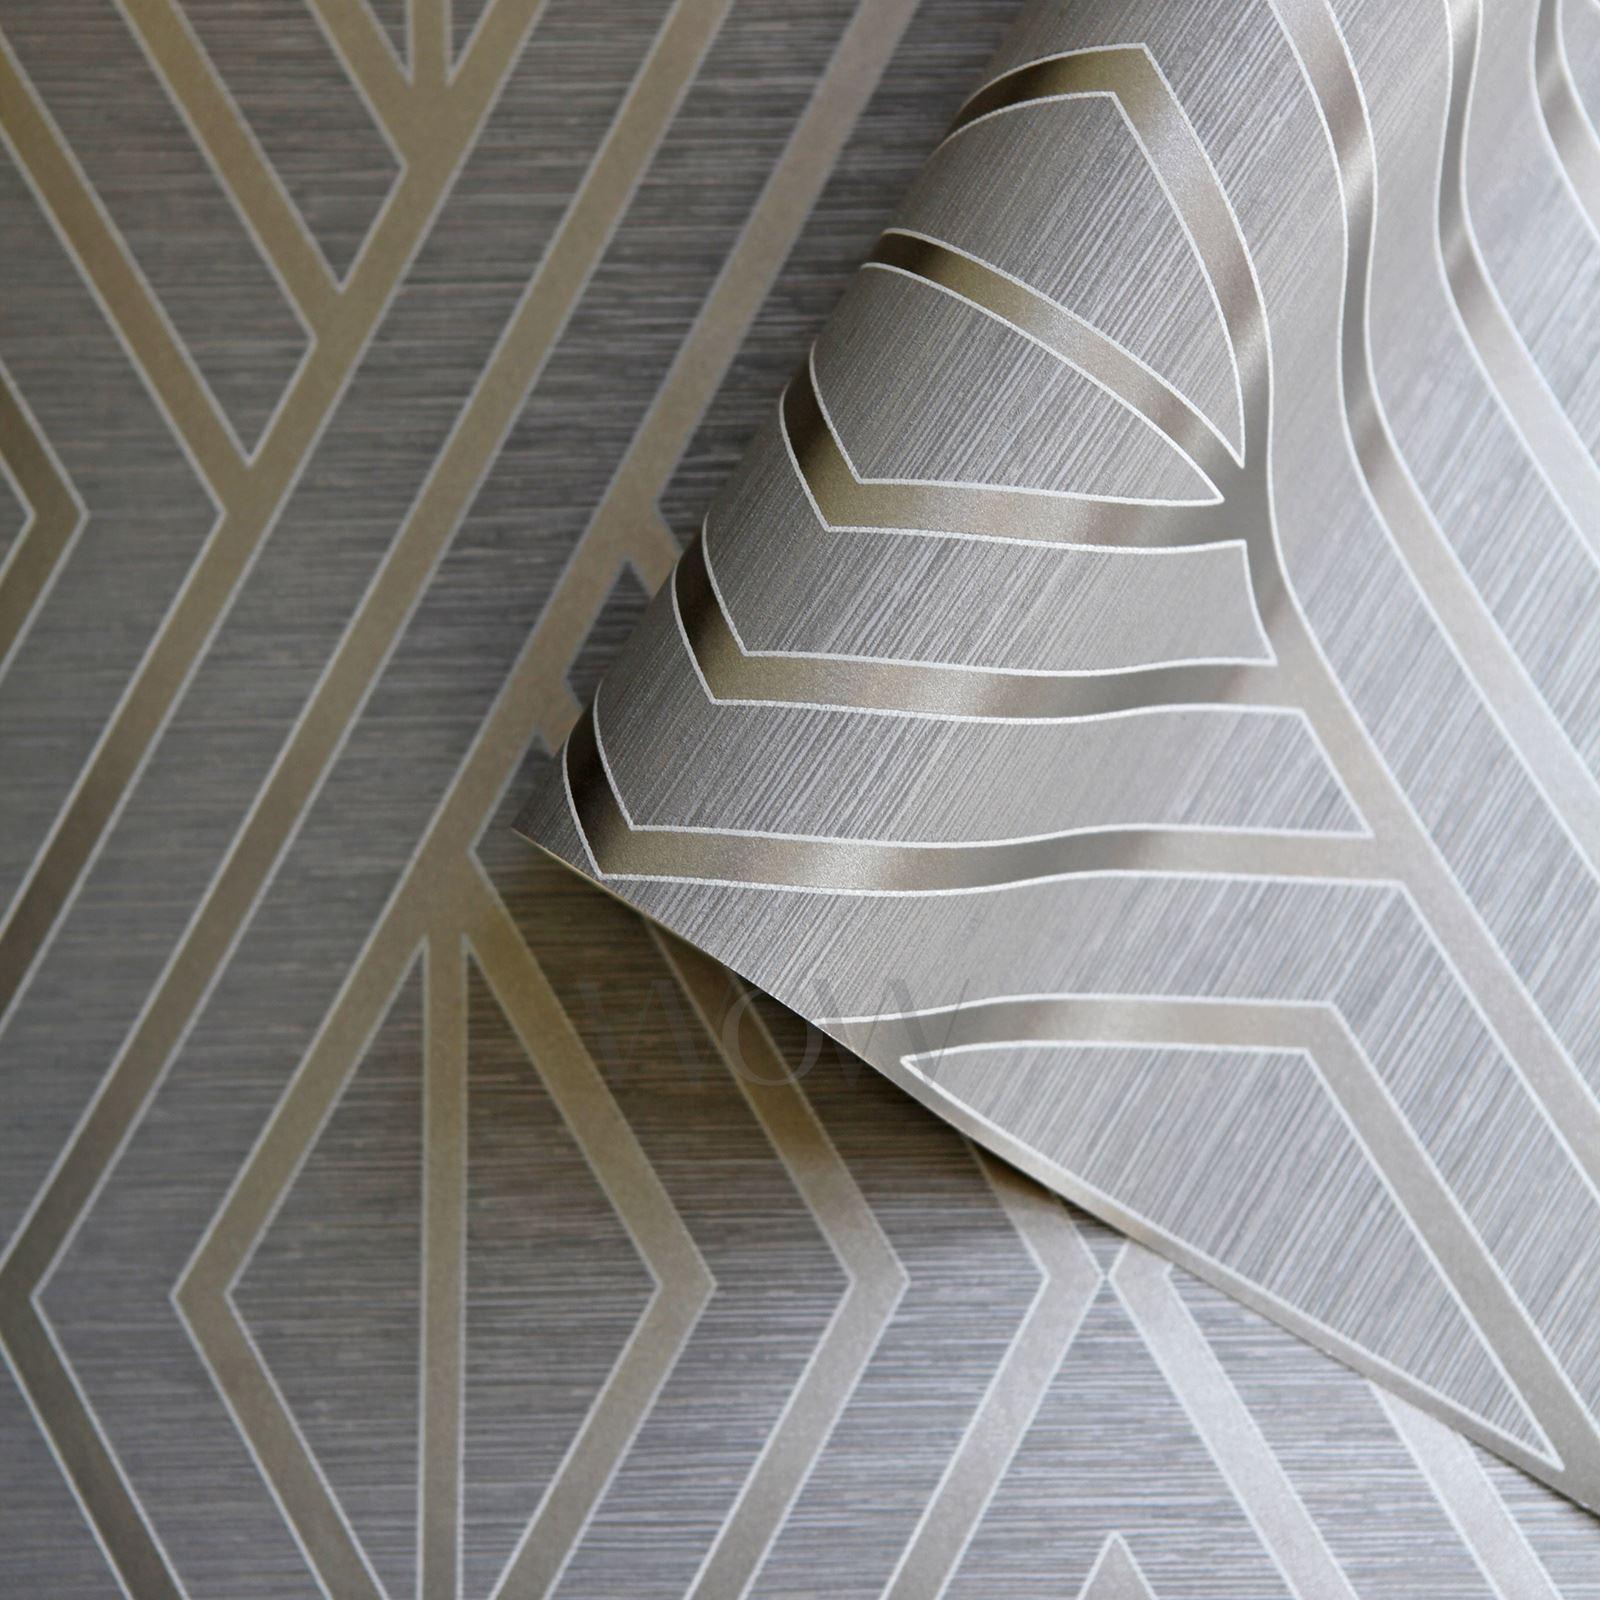 miniatura 60 - Carta da Parati Geometrica Arredamento Camera Moderno Vari Disegni e Colori